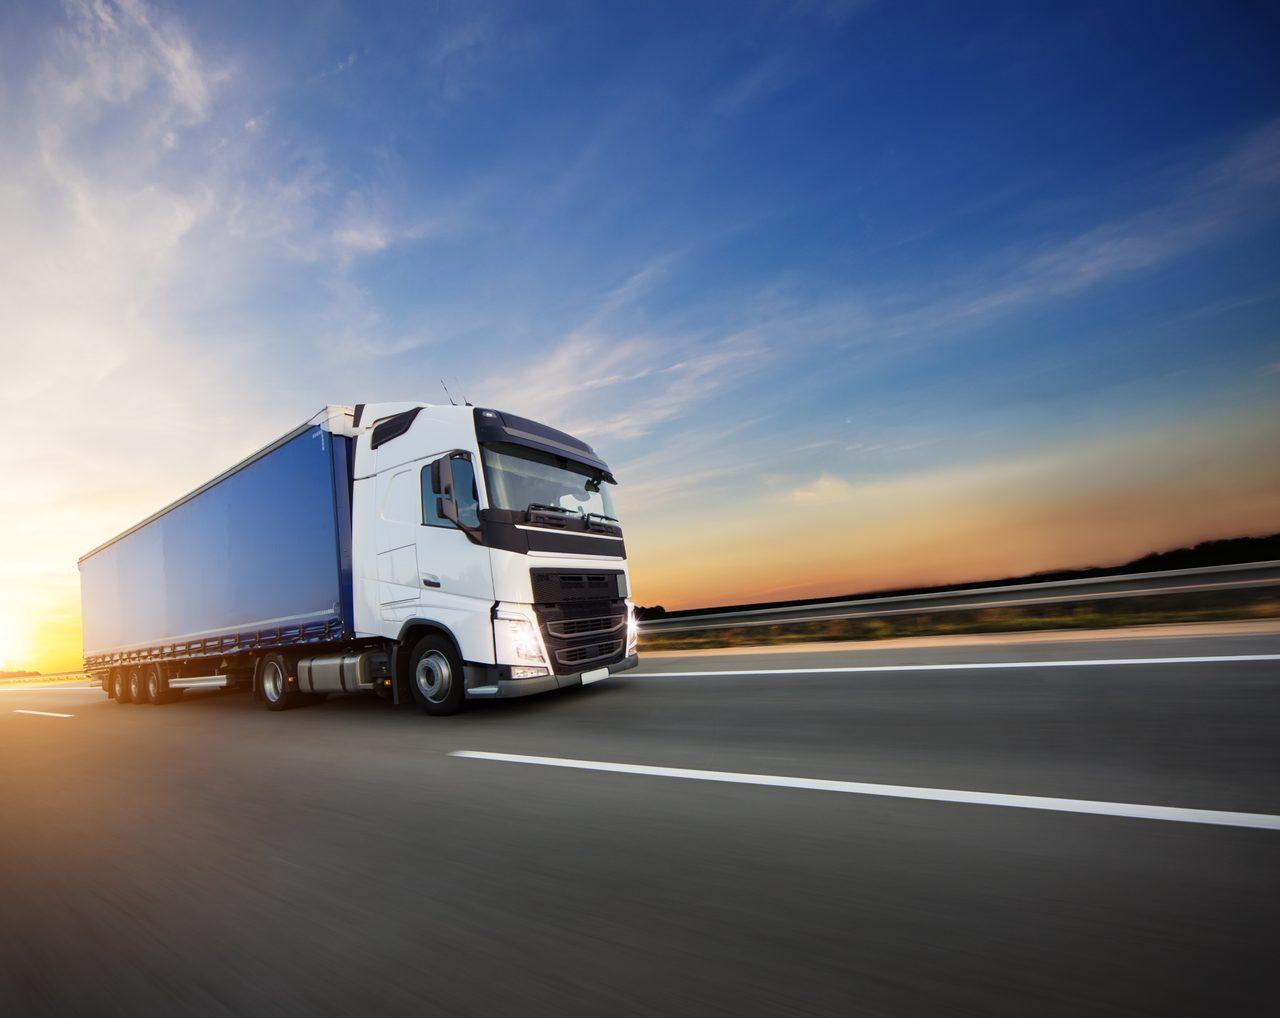 Automotive side-view mirror, Land vehicle, Cloud, Sky, Tire, Wheel, Truck